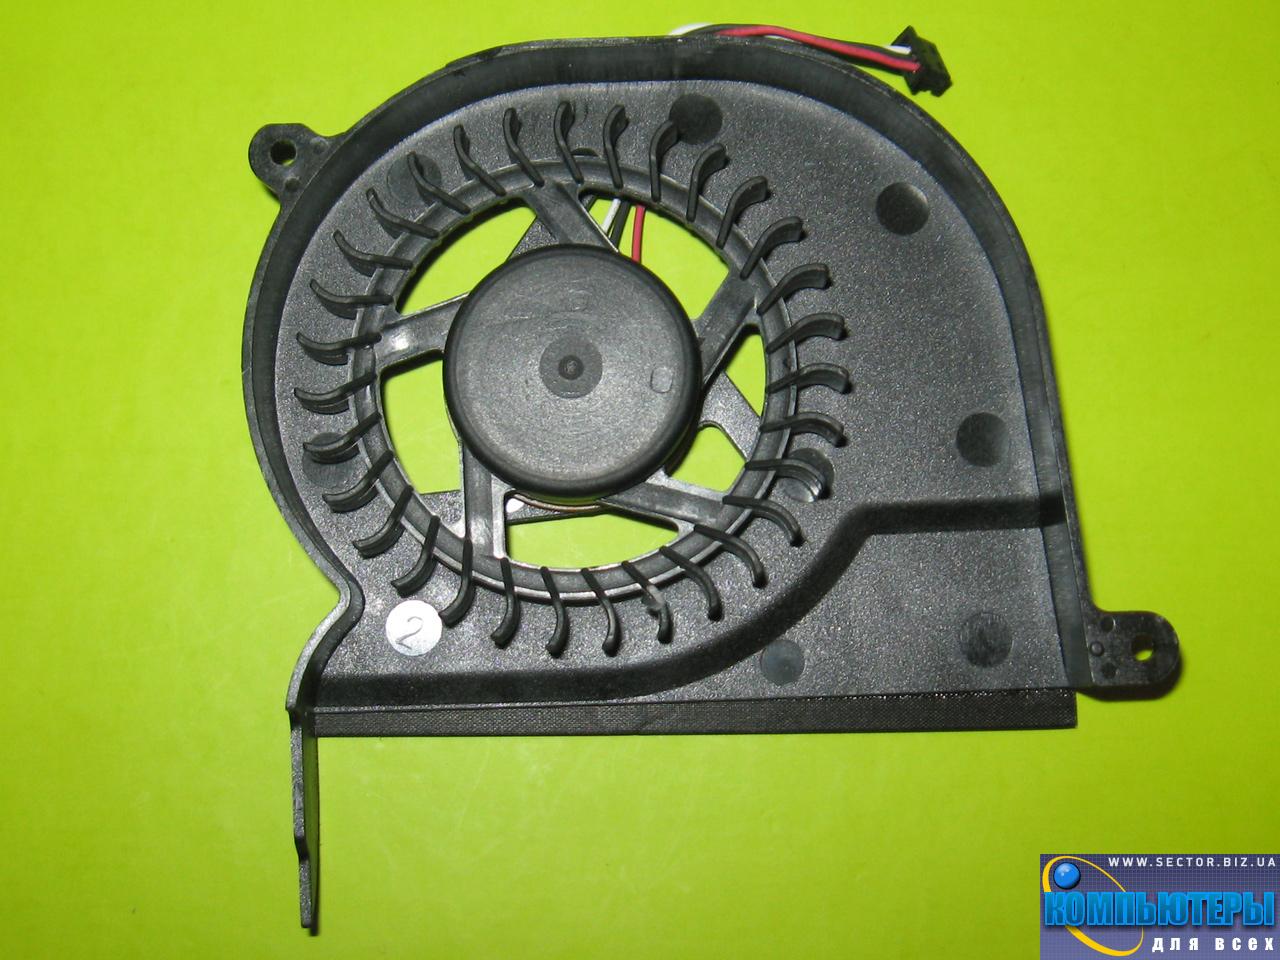 Кулер к ноутбуку Samsung RV509 RV511 RV513 RV515 RV518 RV520 RV409 RV411 RV415 RV420 p/n: DFS531005MC0T FA5B F81G-5 BA31-00098A. Фото № 1.